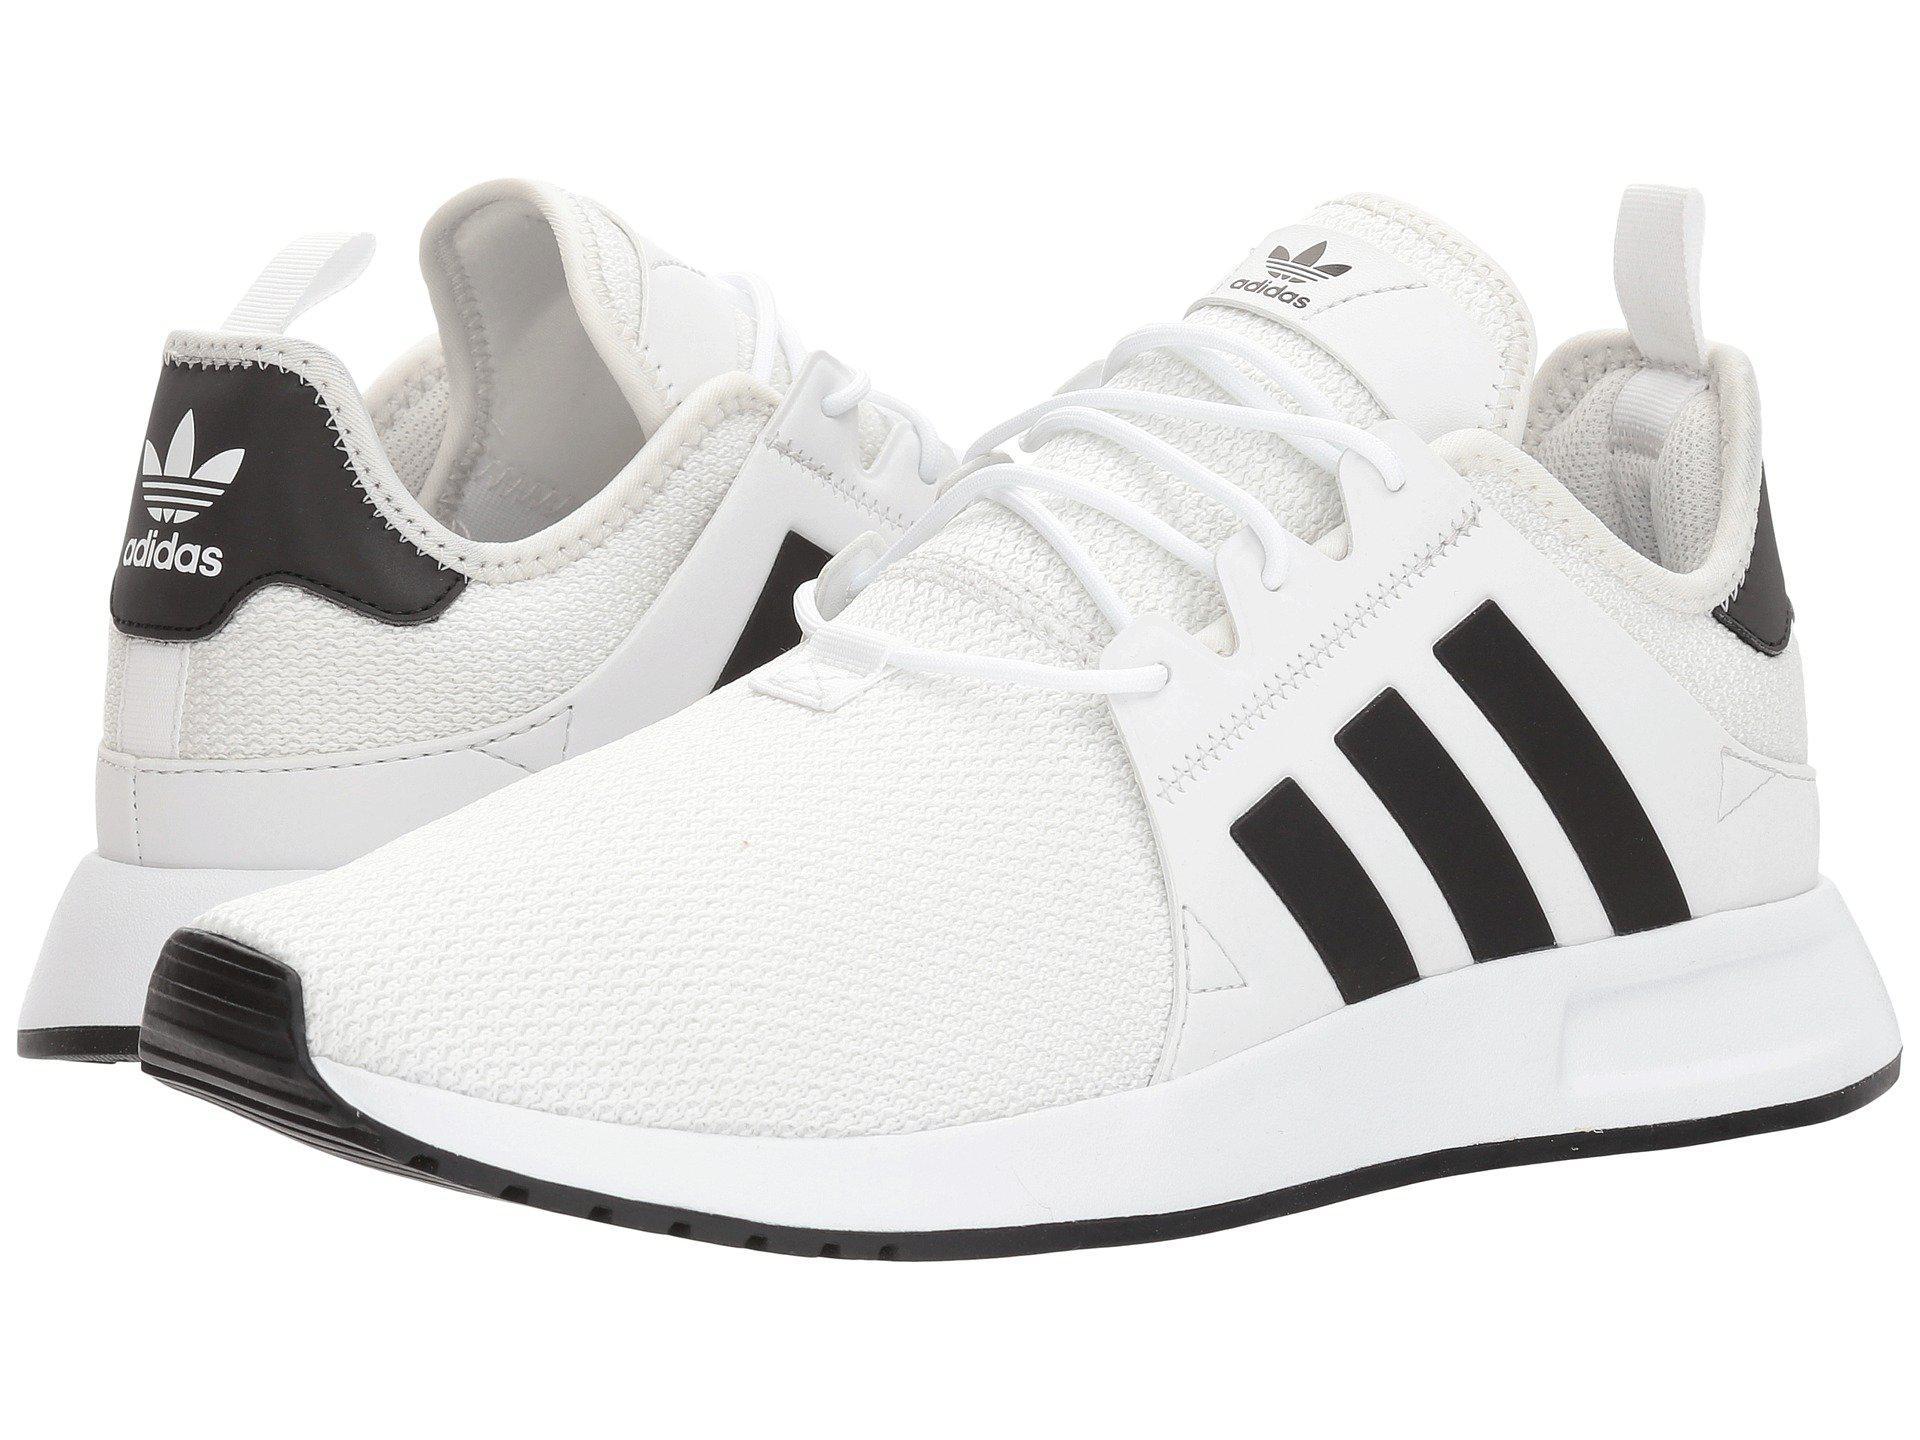 lyst adidas originali x a infrarossi (bianco / nero / bianco tinta), scarpe da uomo